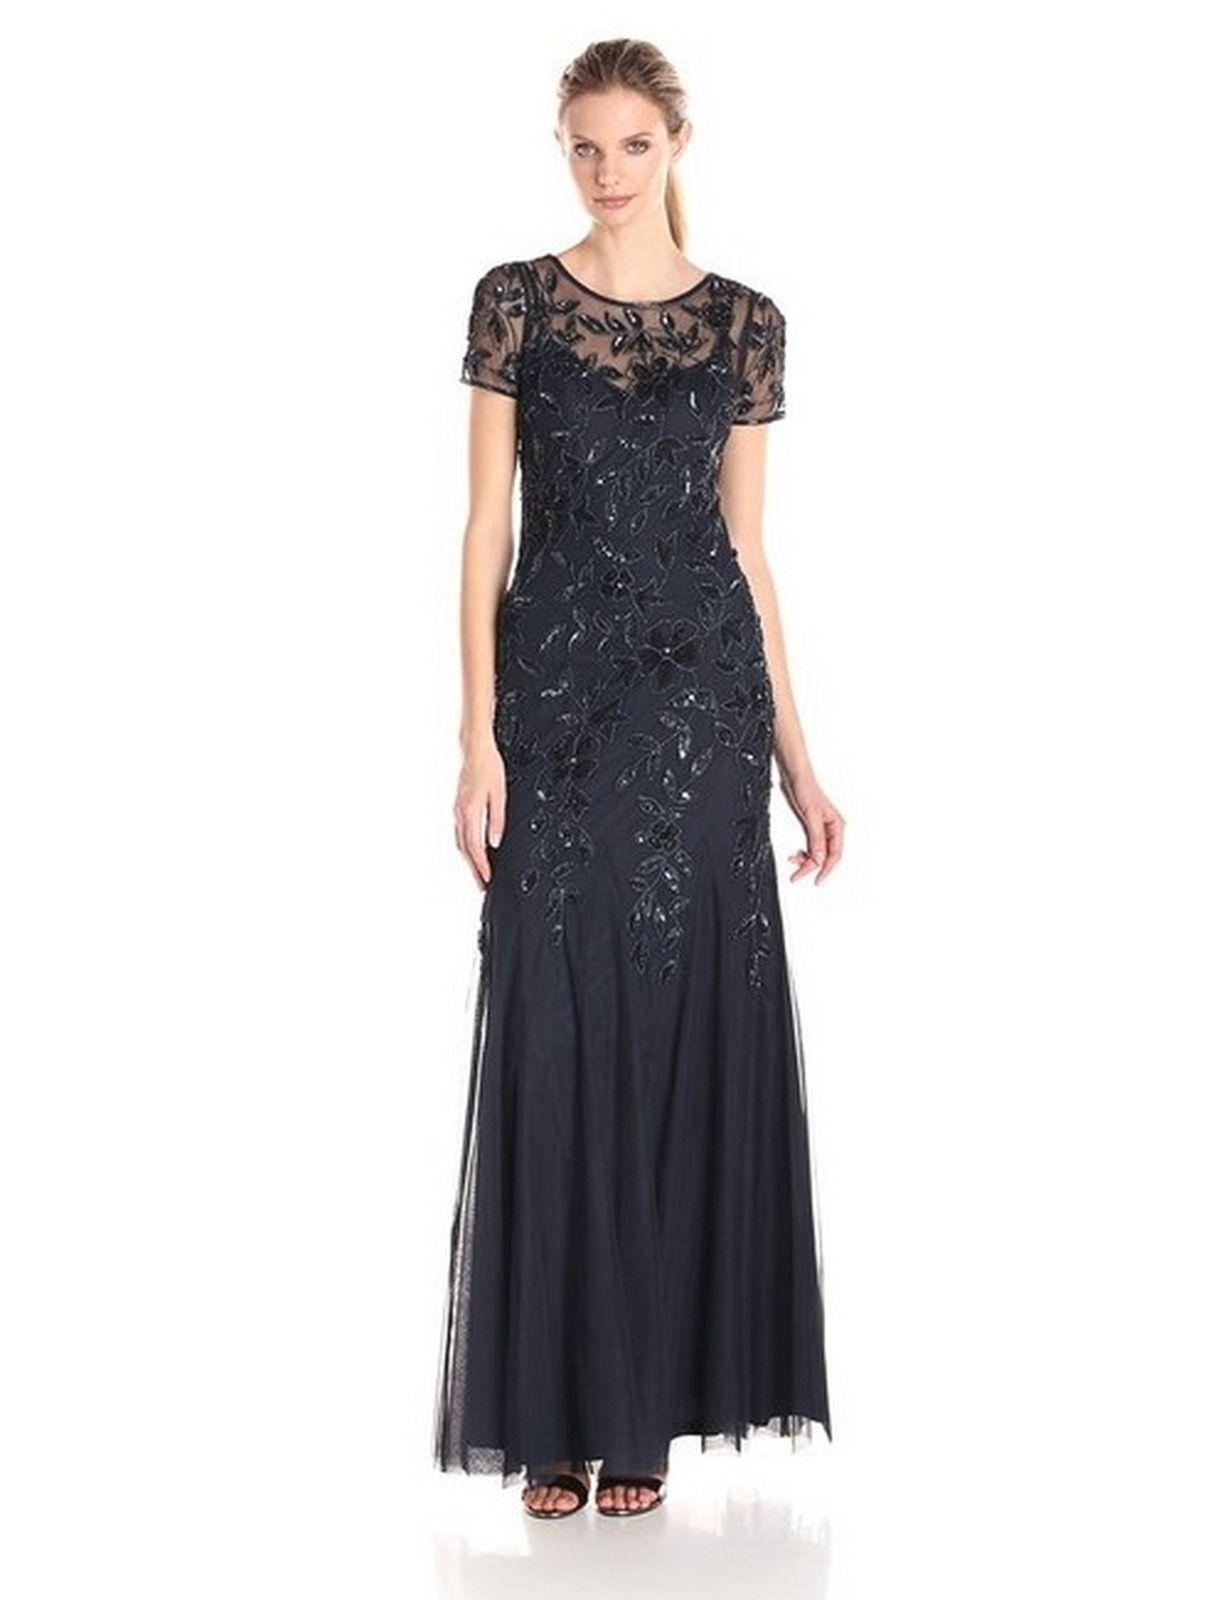 ff05805d4f7 Adrianna Papell Mist Women's Petite Beaded Godet Gown (Twilight ) Formal  Dress $118 Effortlessly attain